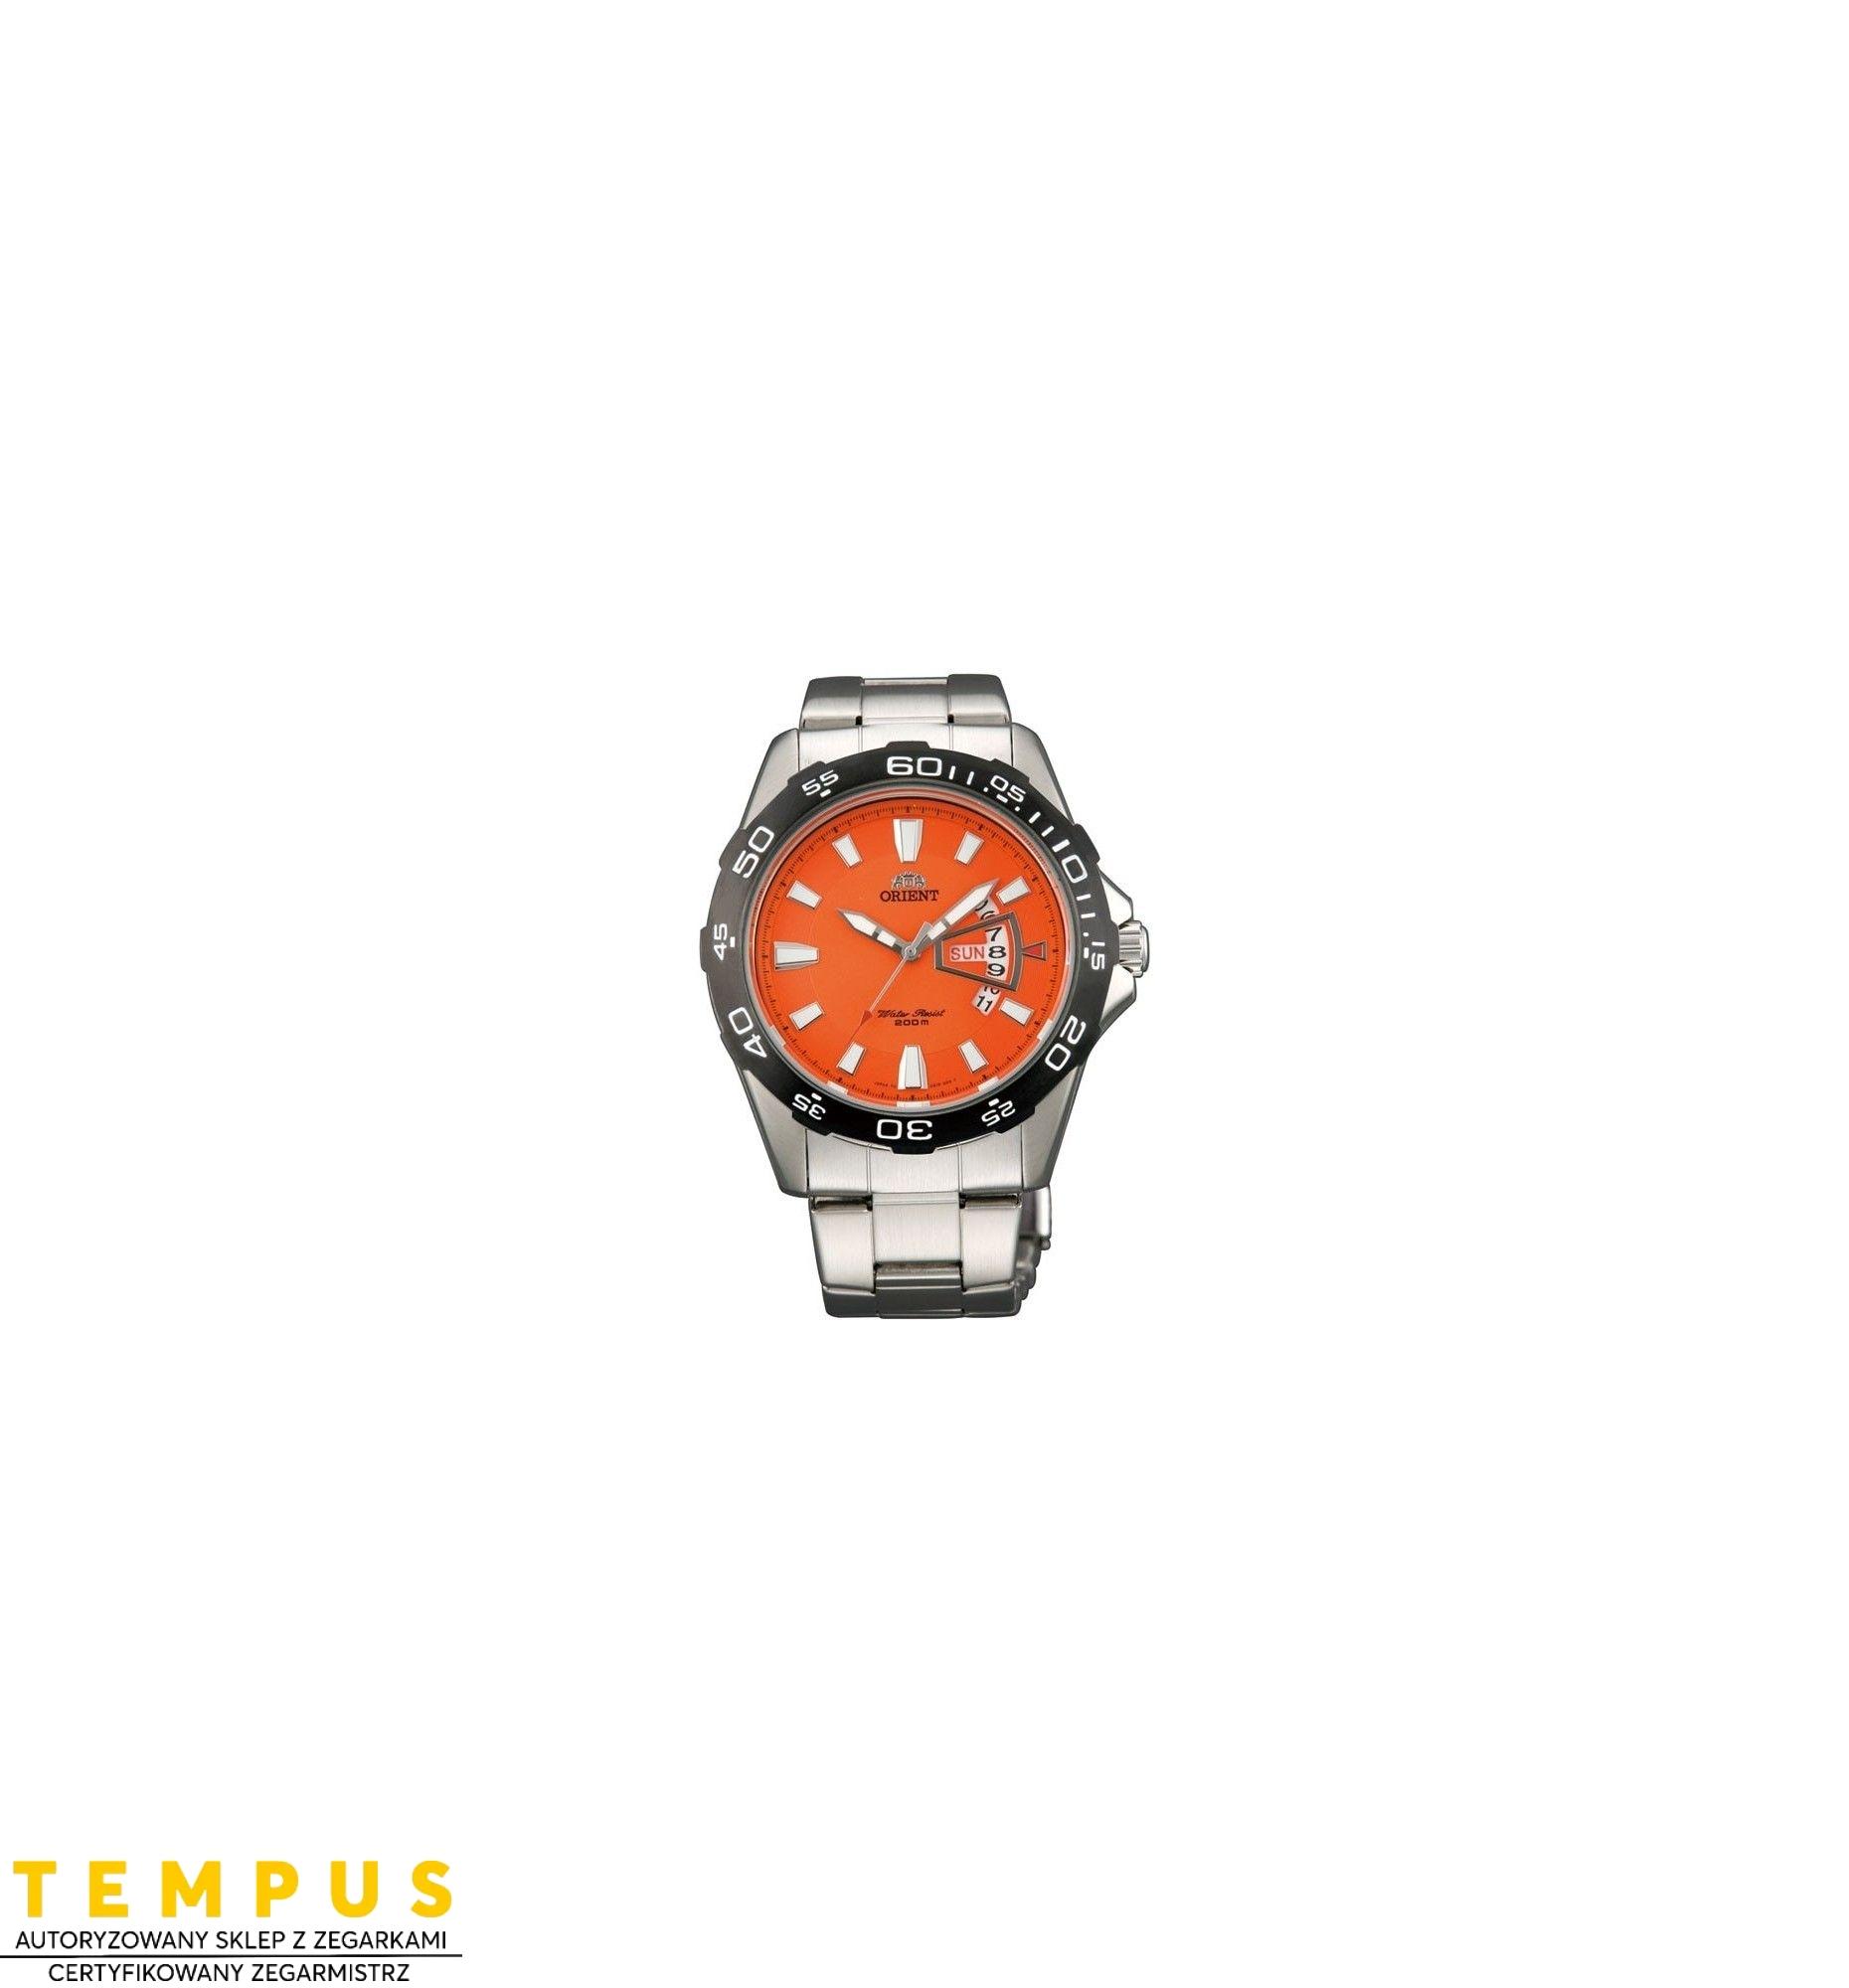 Zegarek Męski ORIENT FUG1S002M6 - Tempus